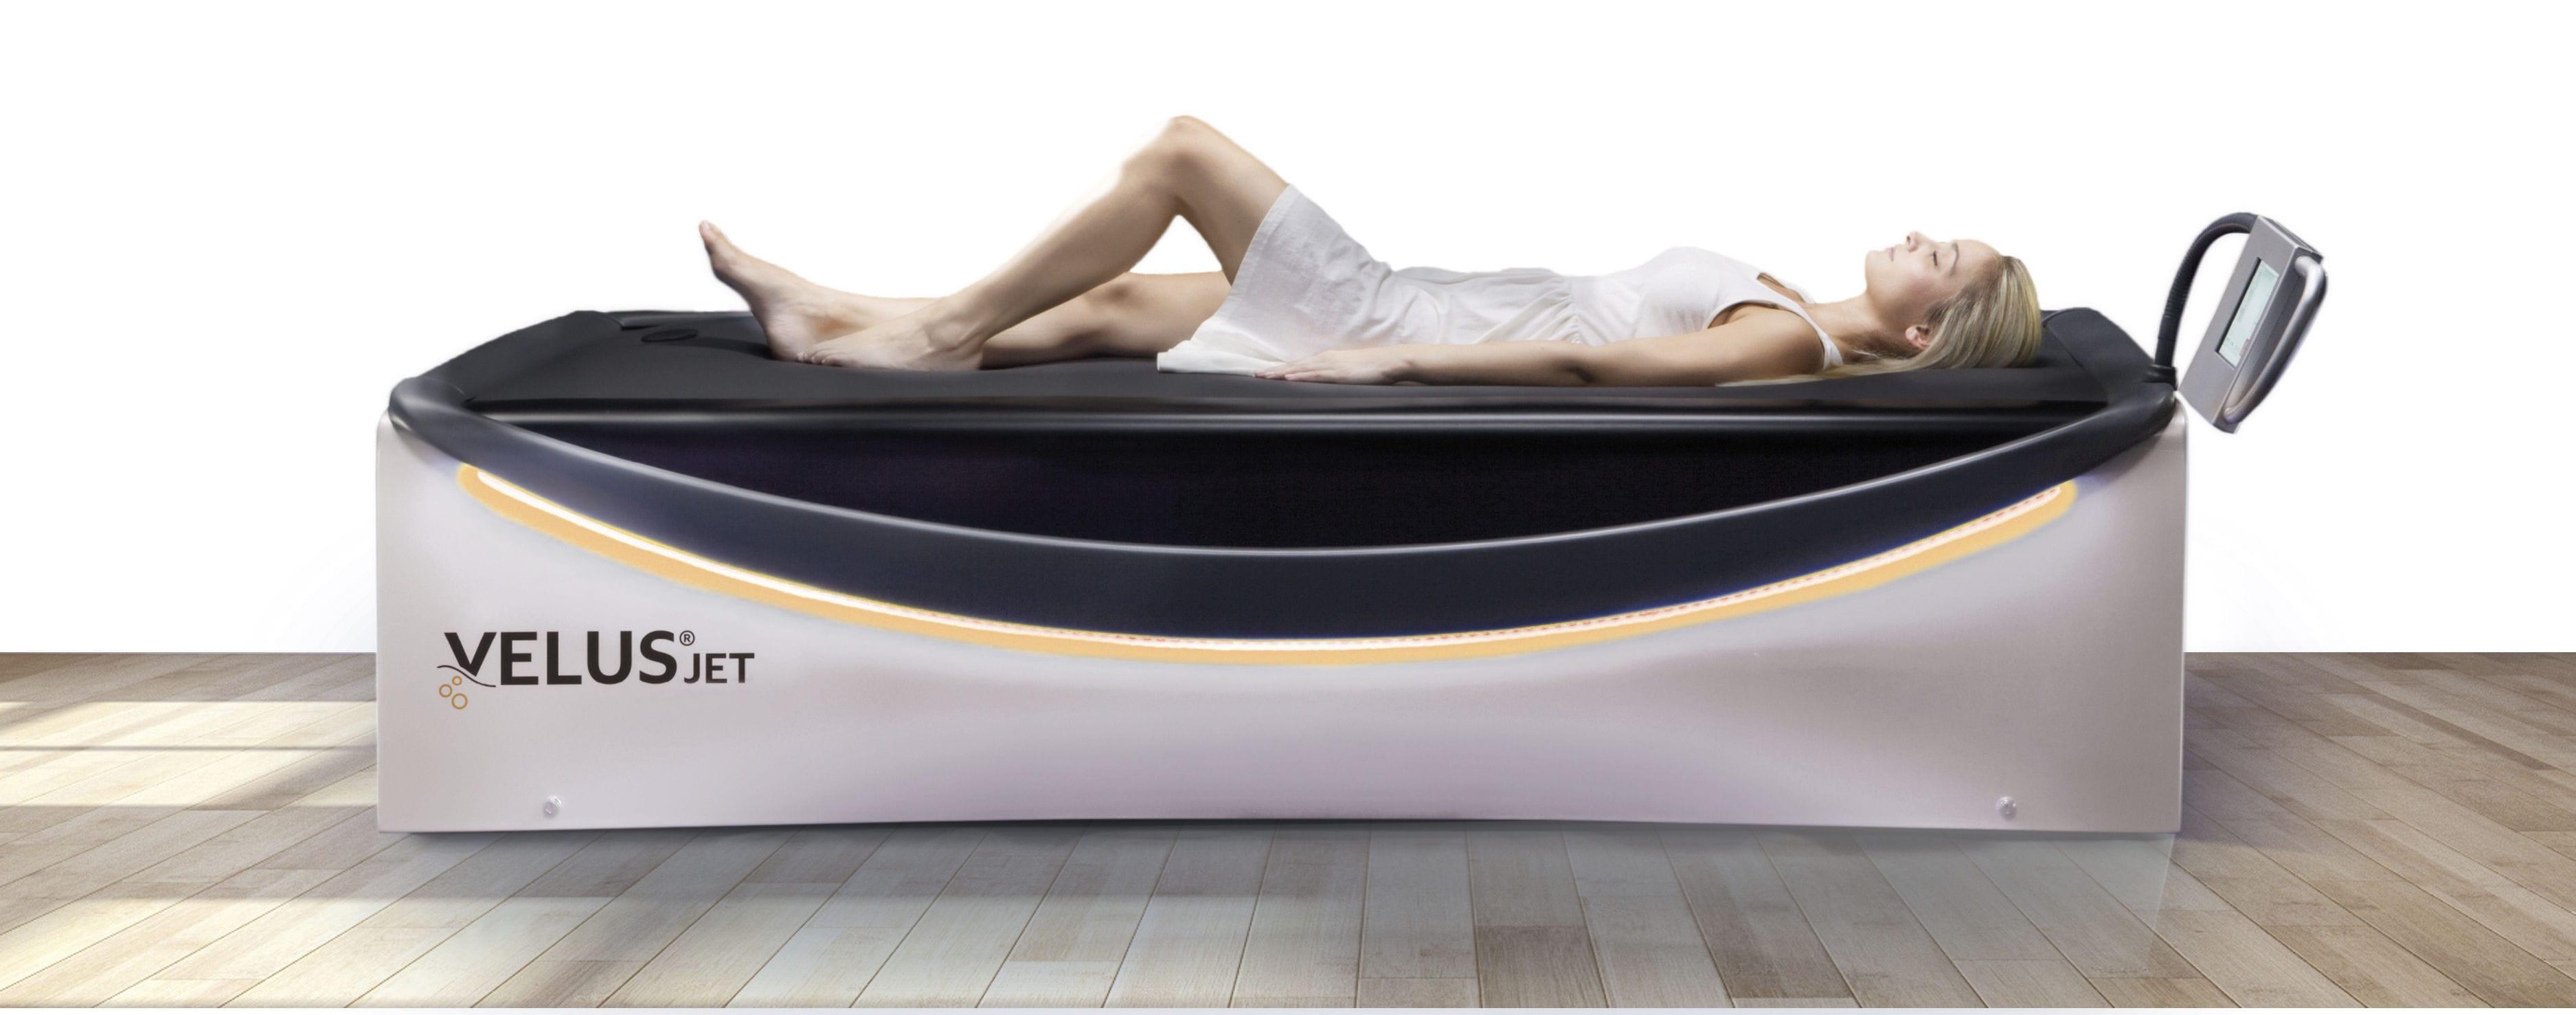 Hydromassage table with water jet - VelusJet® - Böckelt